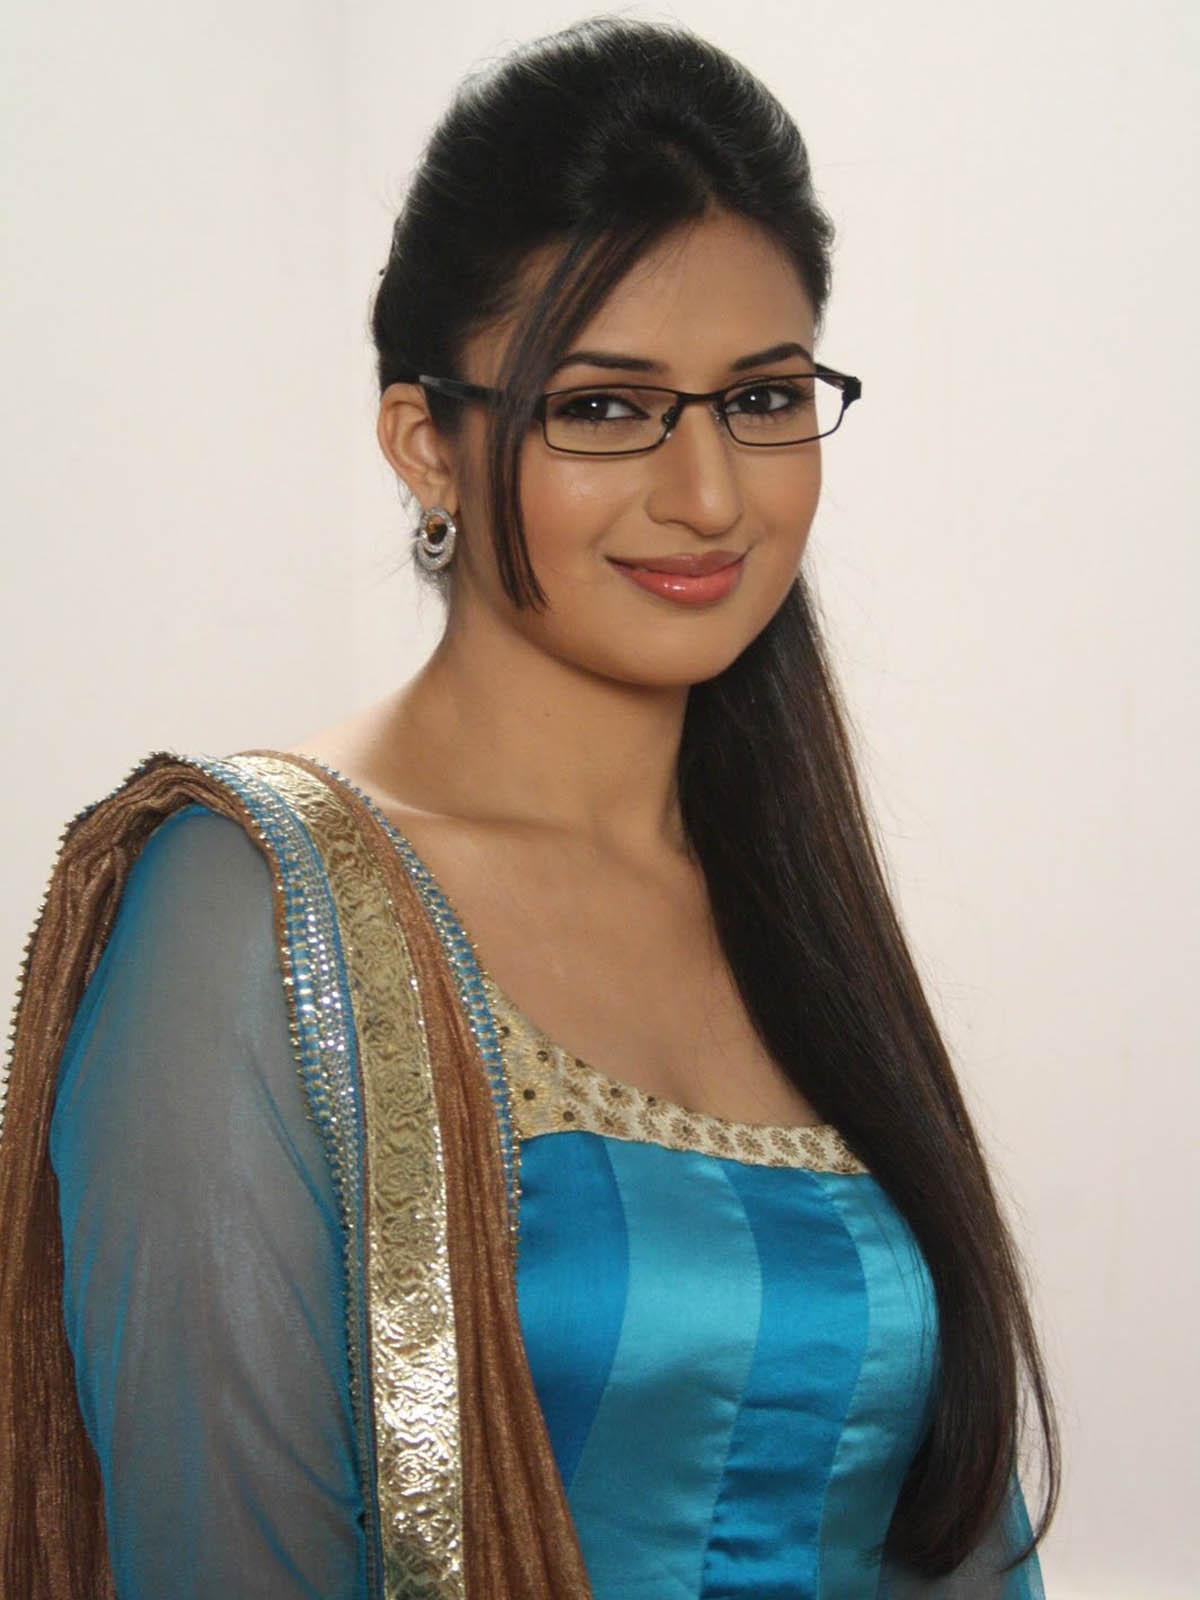 For wedding bridal entertainment desi wedding indian bridal hair - Yanka Tripathi Junglekey In Image